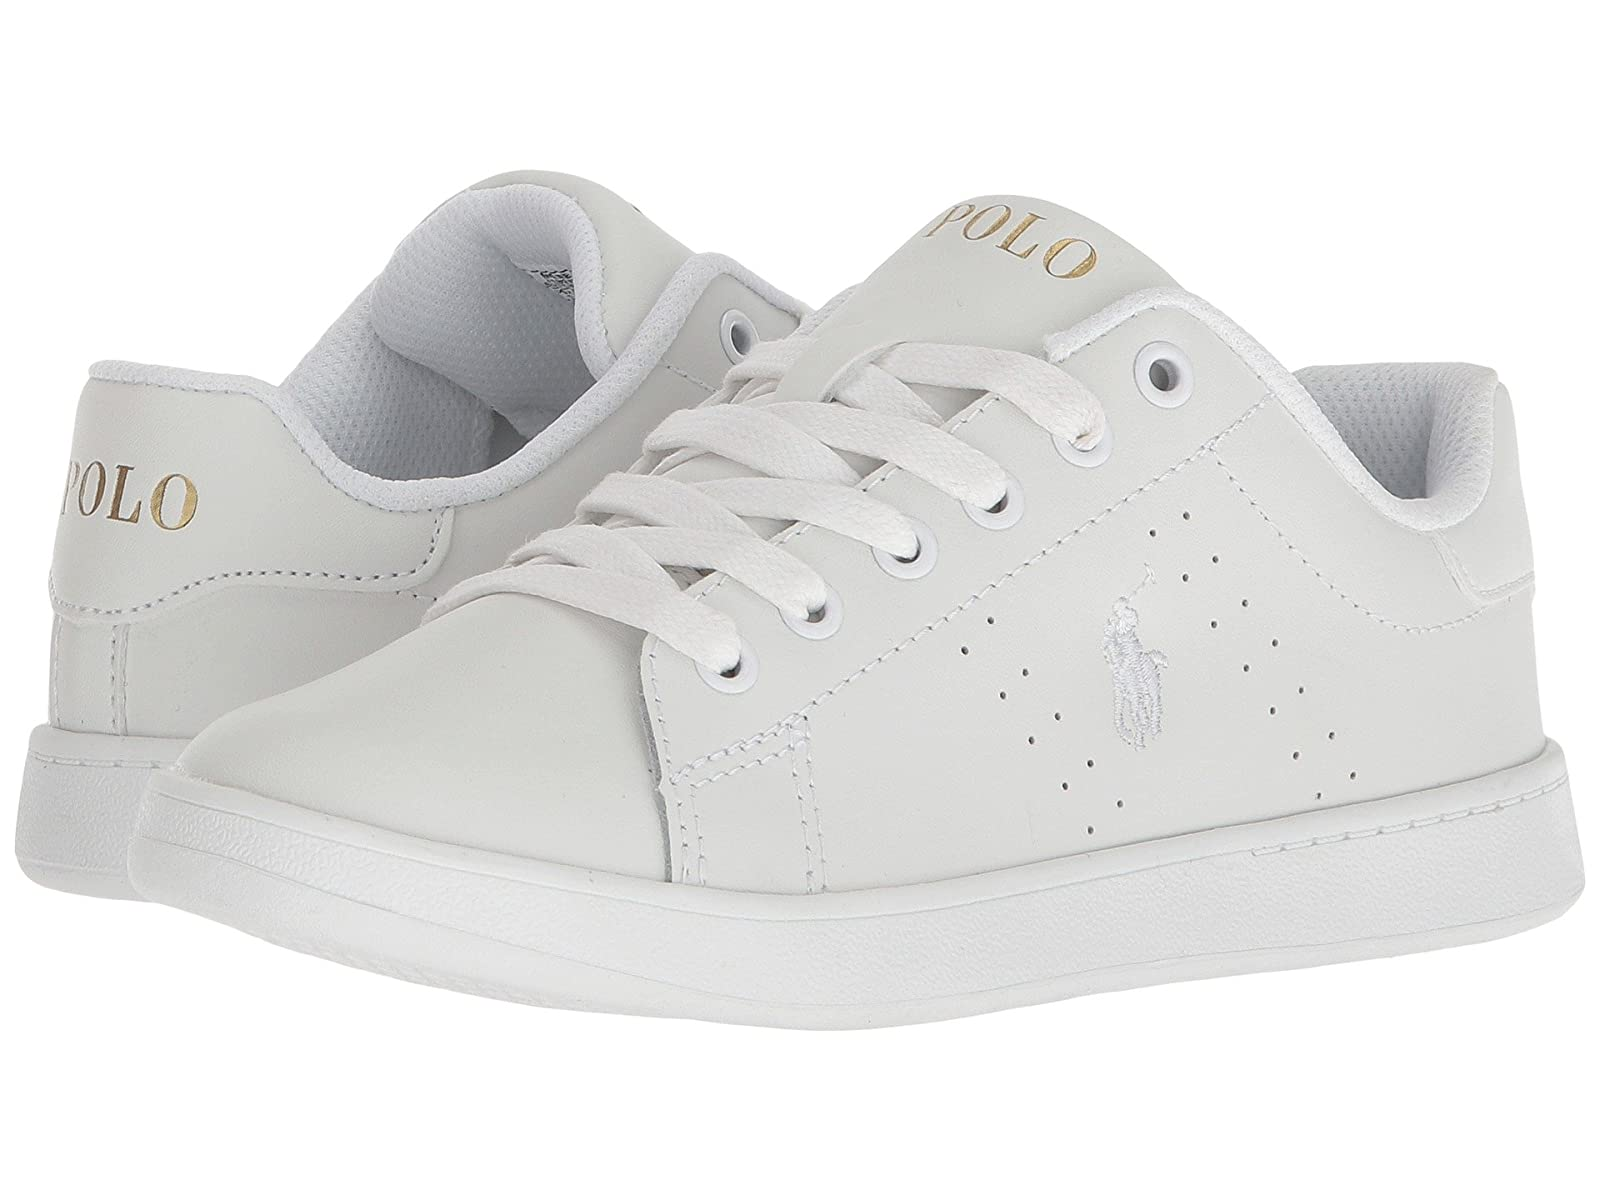 Polo Ralph Lauren Kids Quilton (Little Kid)Atmospheric grades have affordable shoes